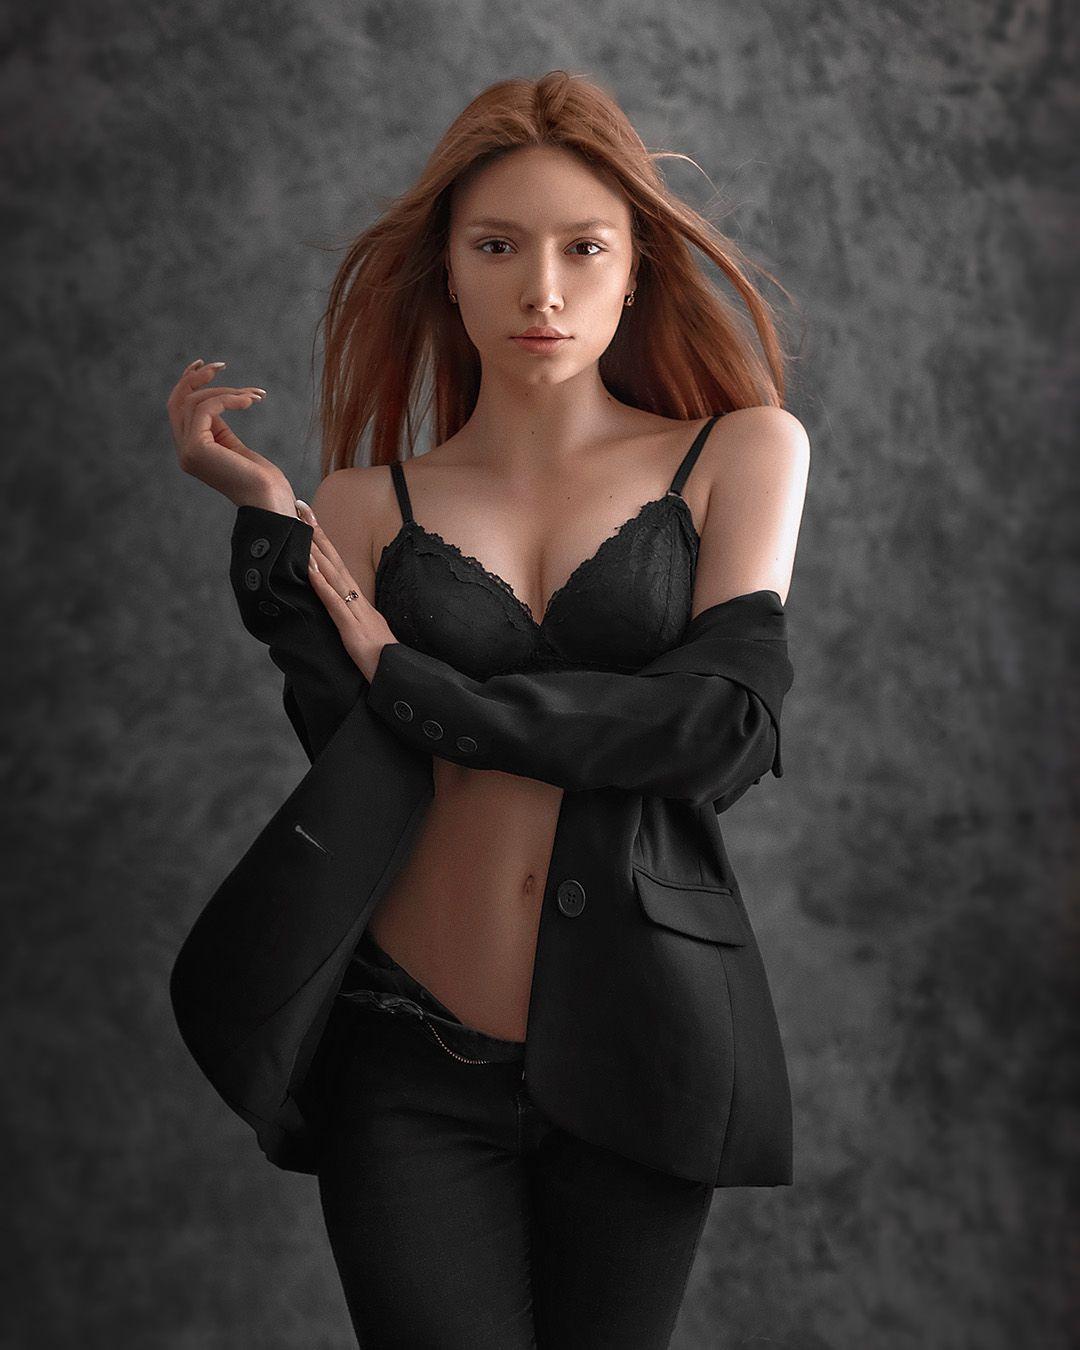 art, model, portrait, girl, арт, модель, портрет, девушка, Евгений Сибиряев